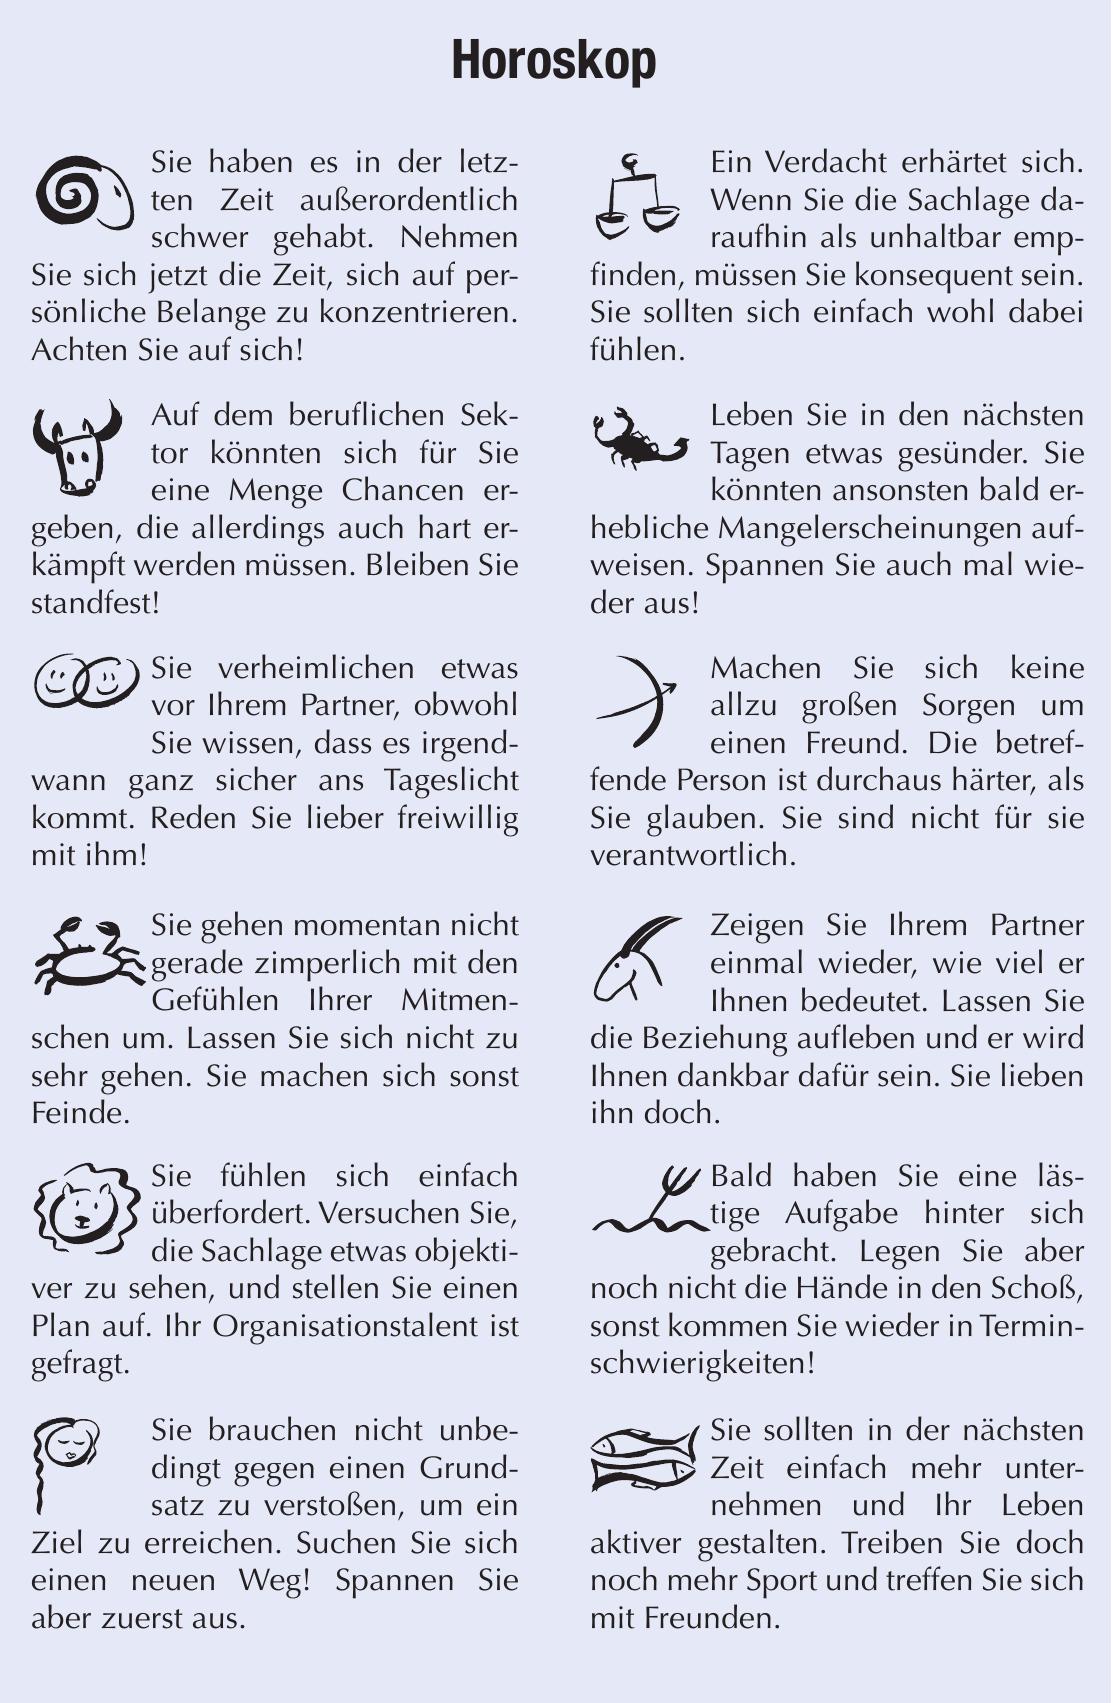 © DEIKE PRESS, Konstanz 17/2021